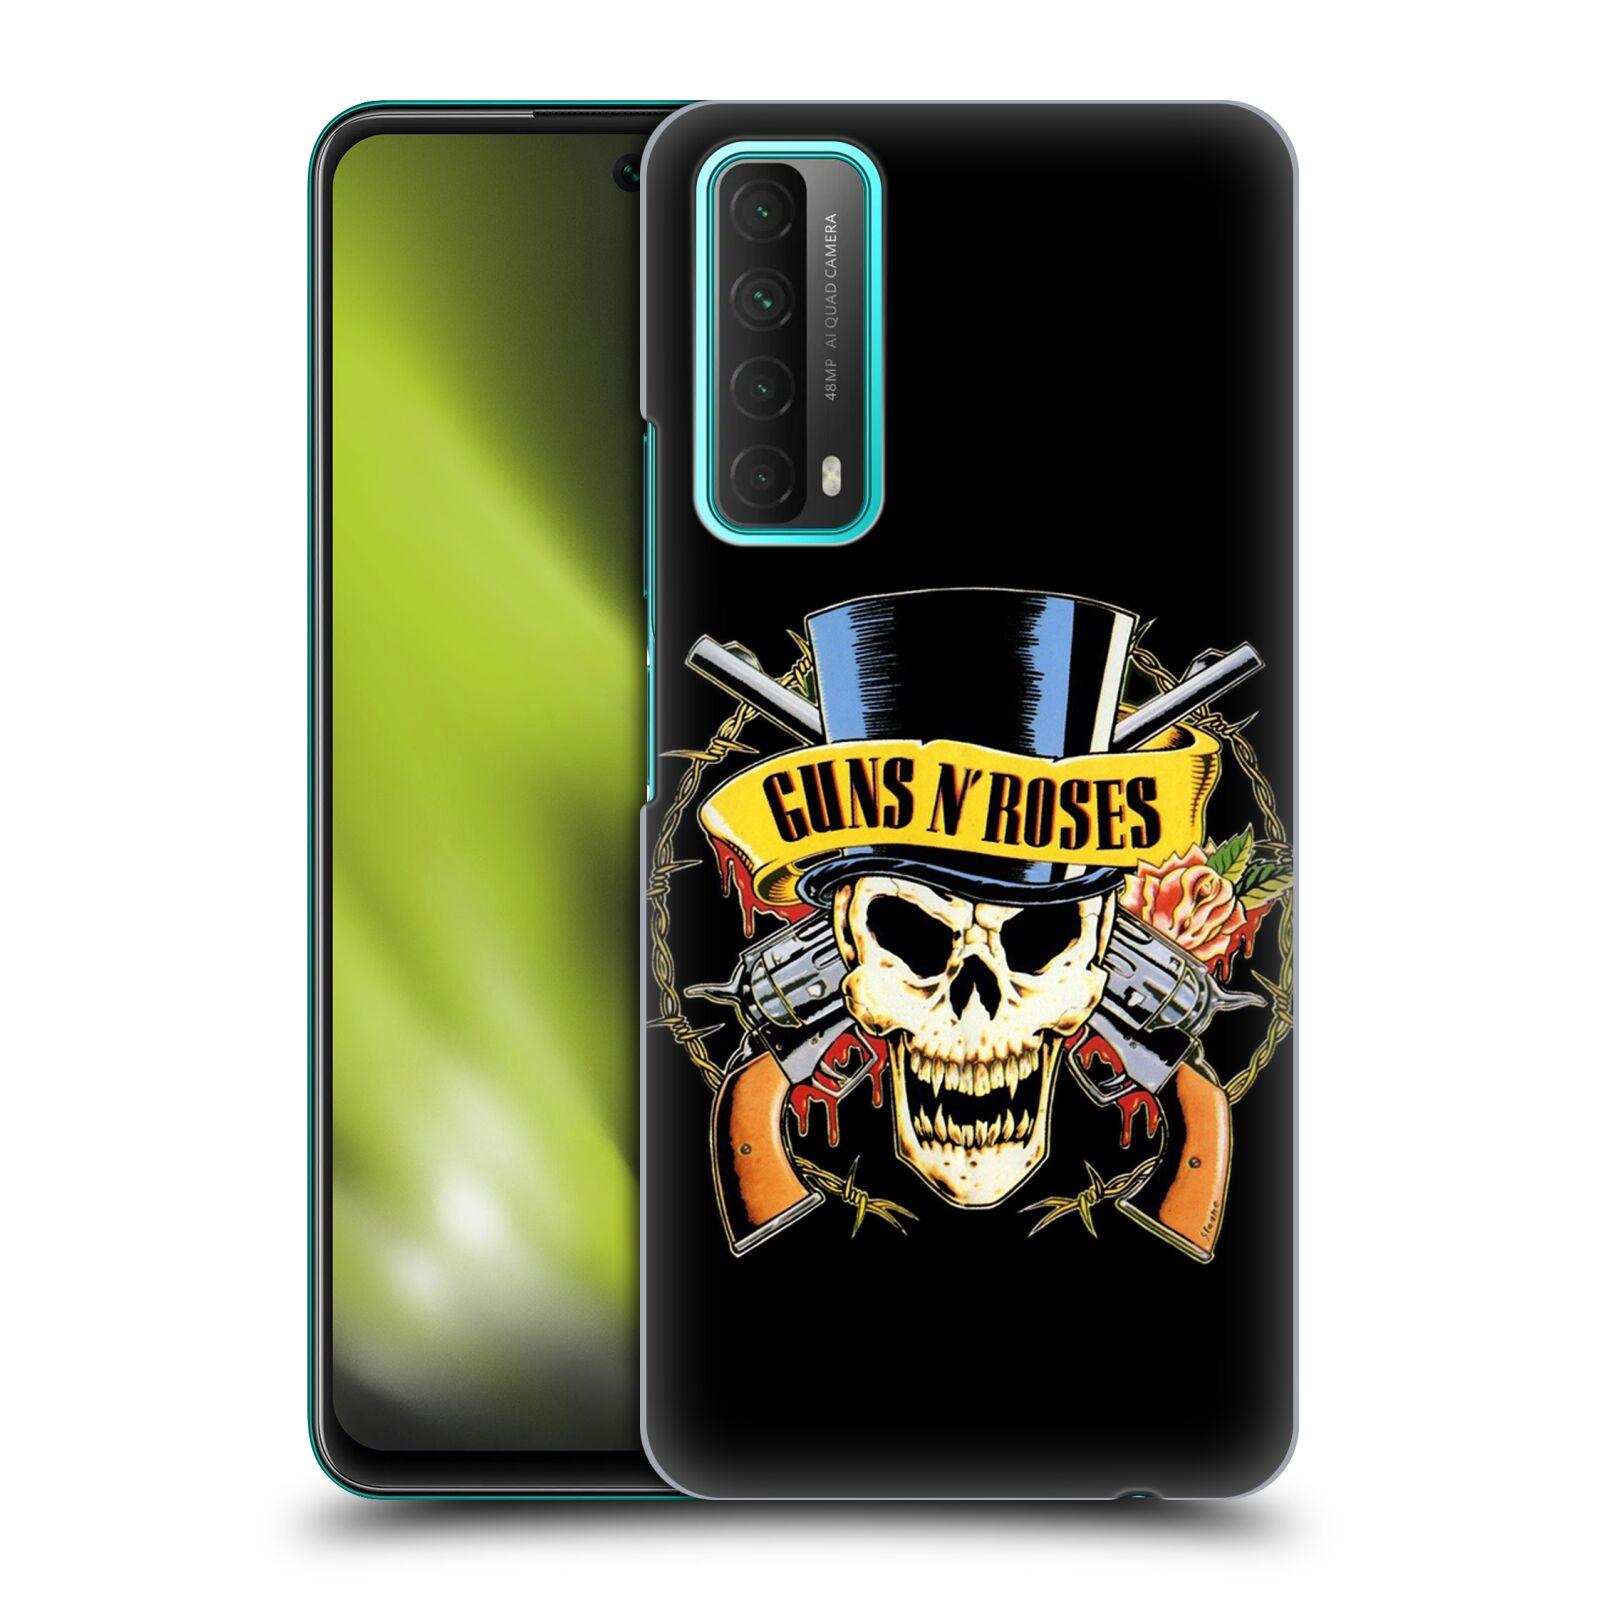 Plastové pouzdro na mobil Huawei P Smart (2021) - Head Case - Guns N' Roses - Lebka